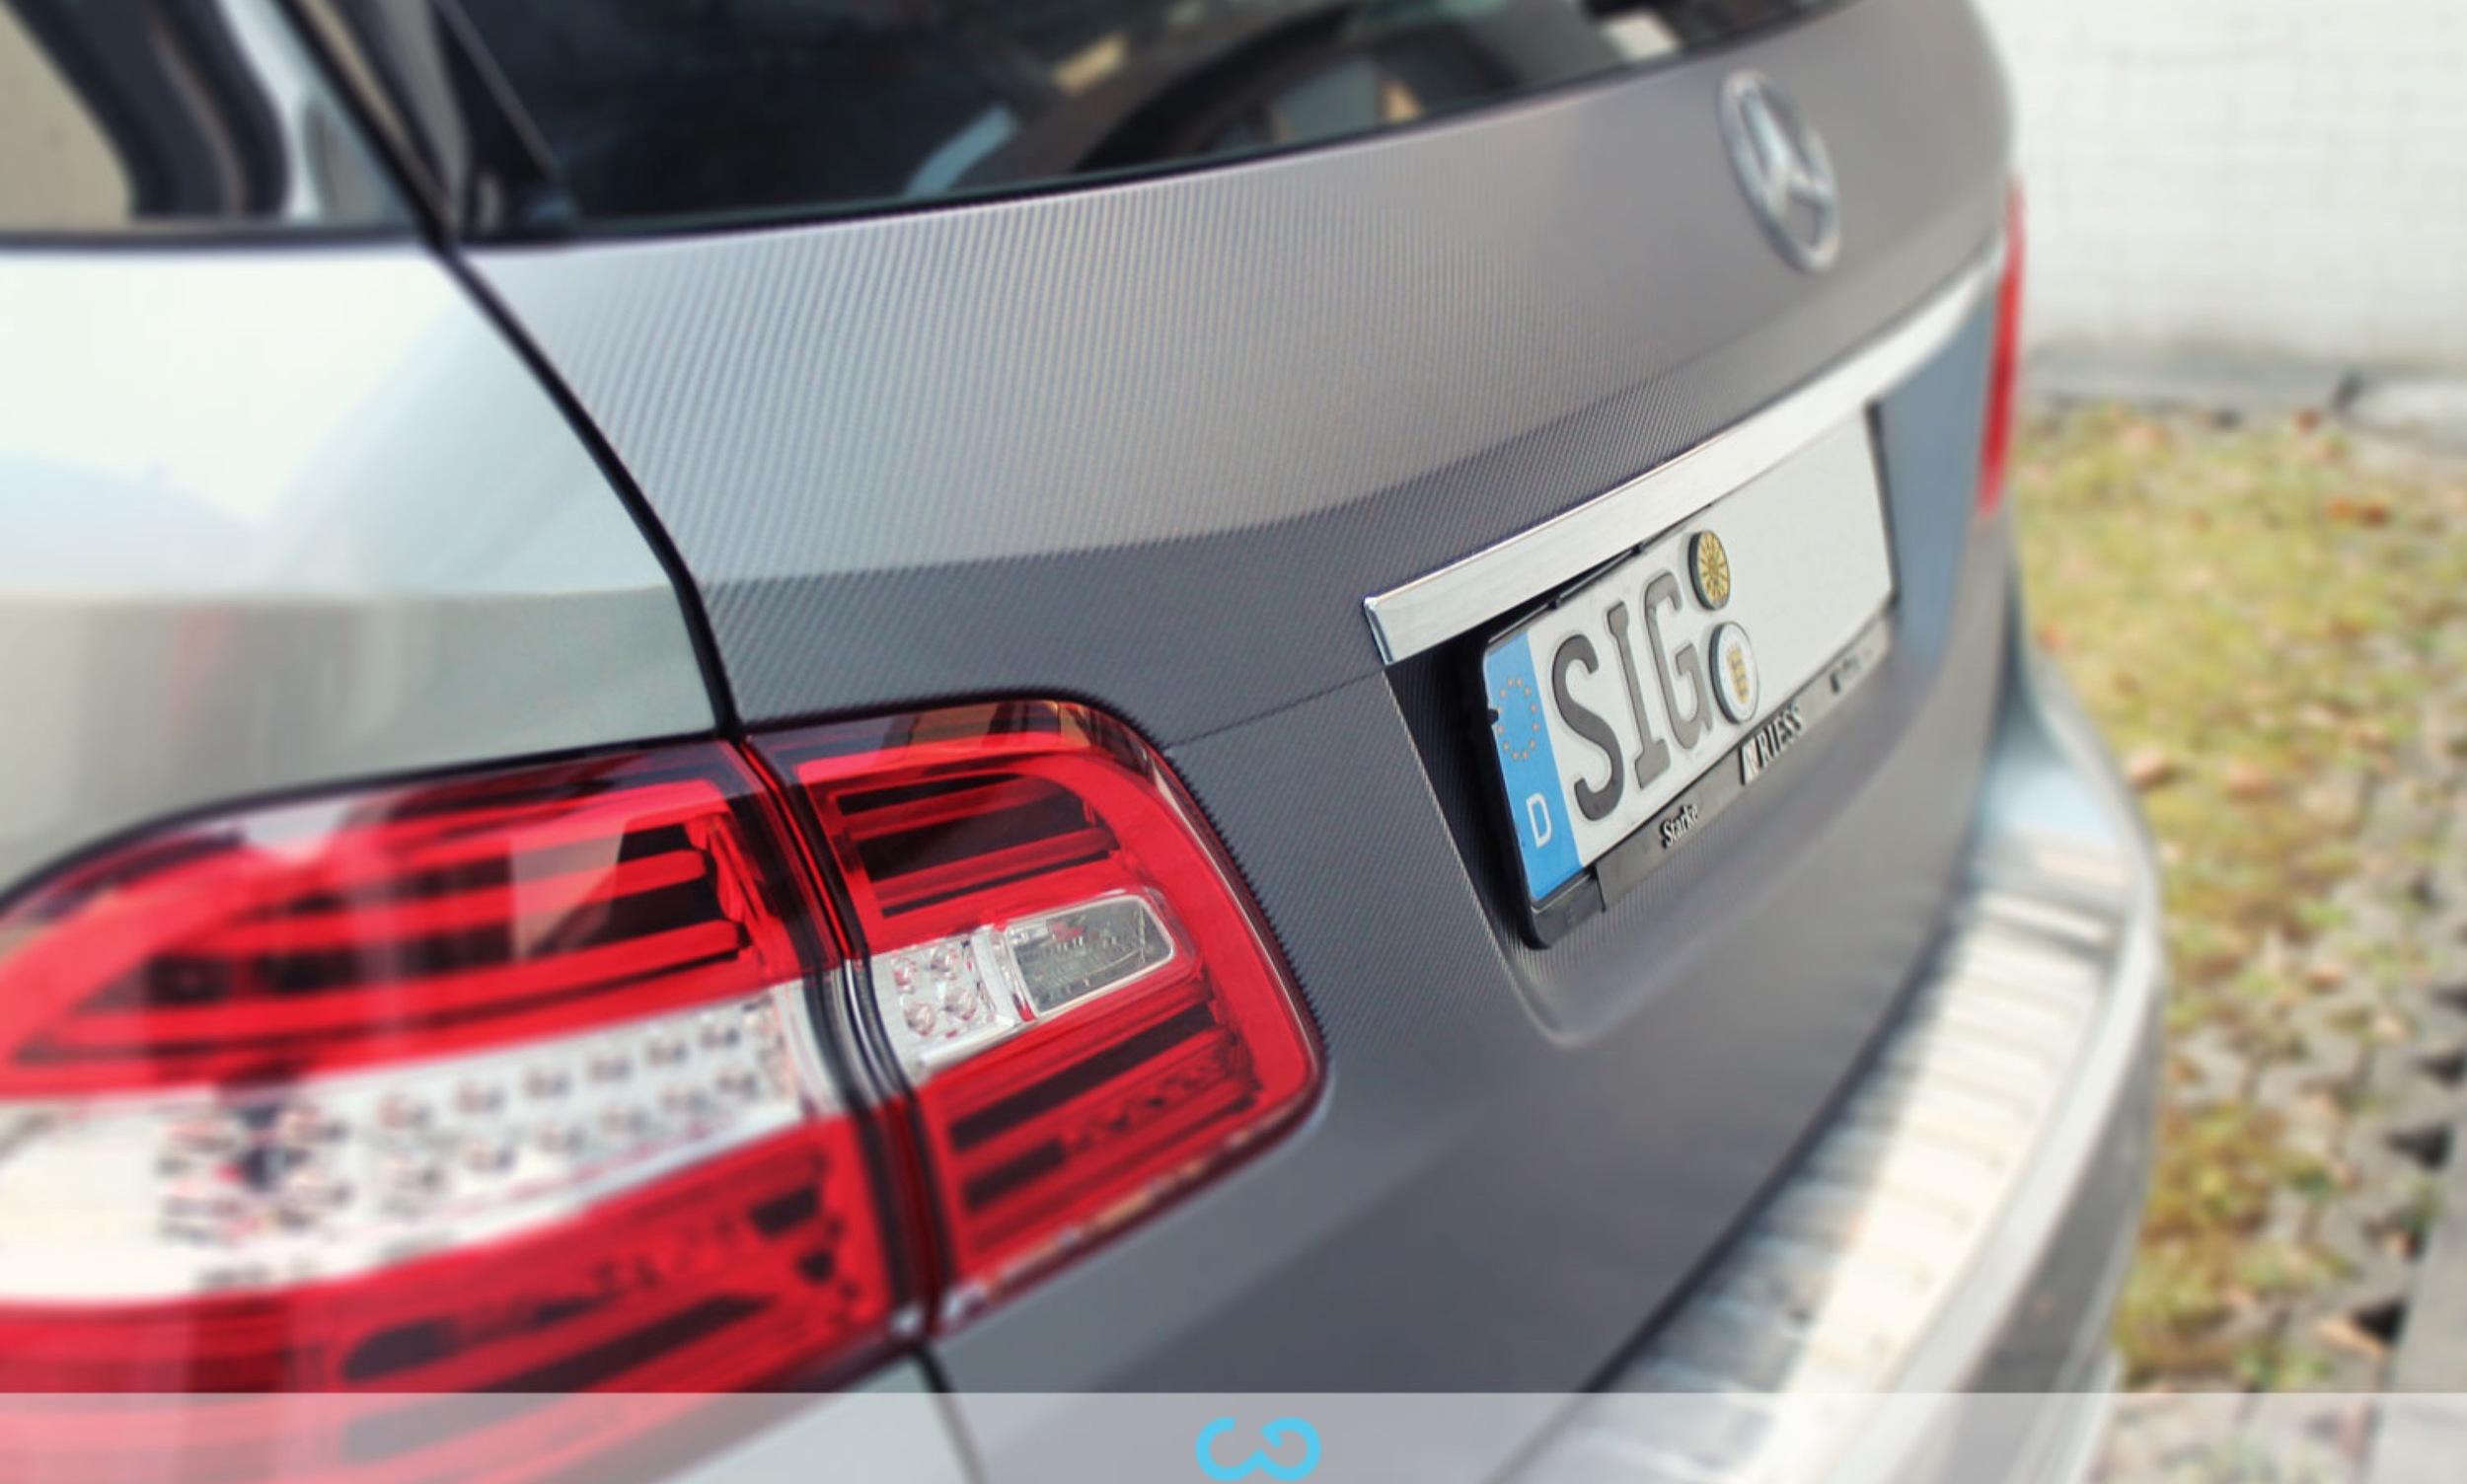 autofolierung-car-wrapping-6-teilfolierung-carbon-motorhaube-dach-mercedes-ml-6-2013-01-121.jpg